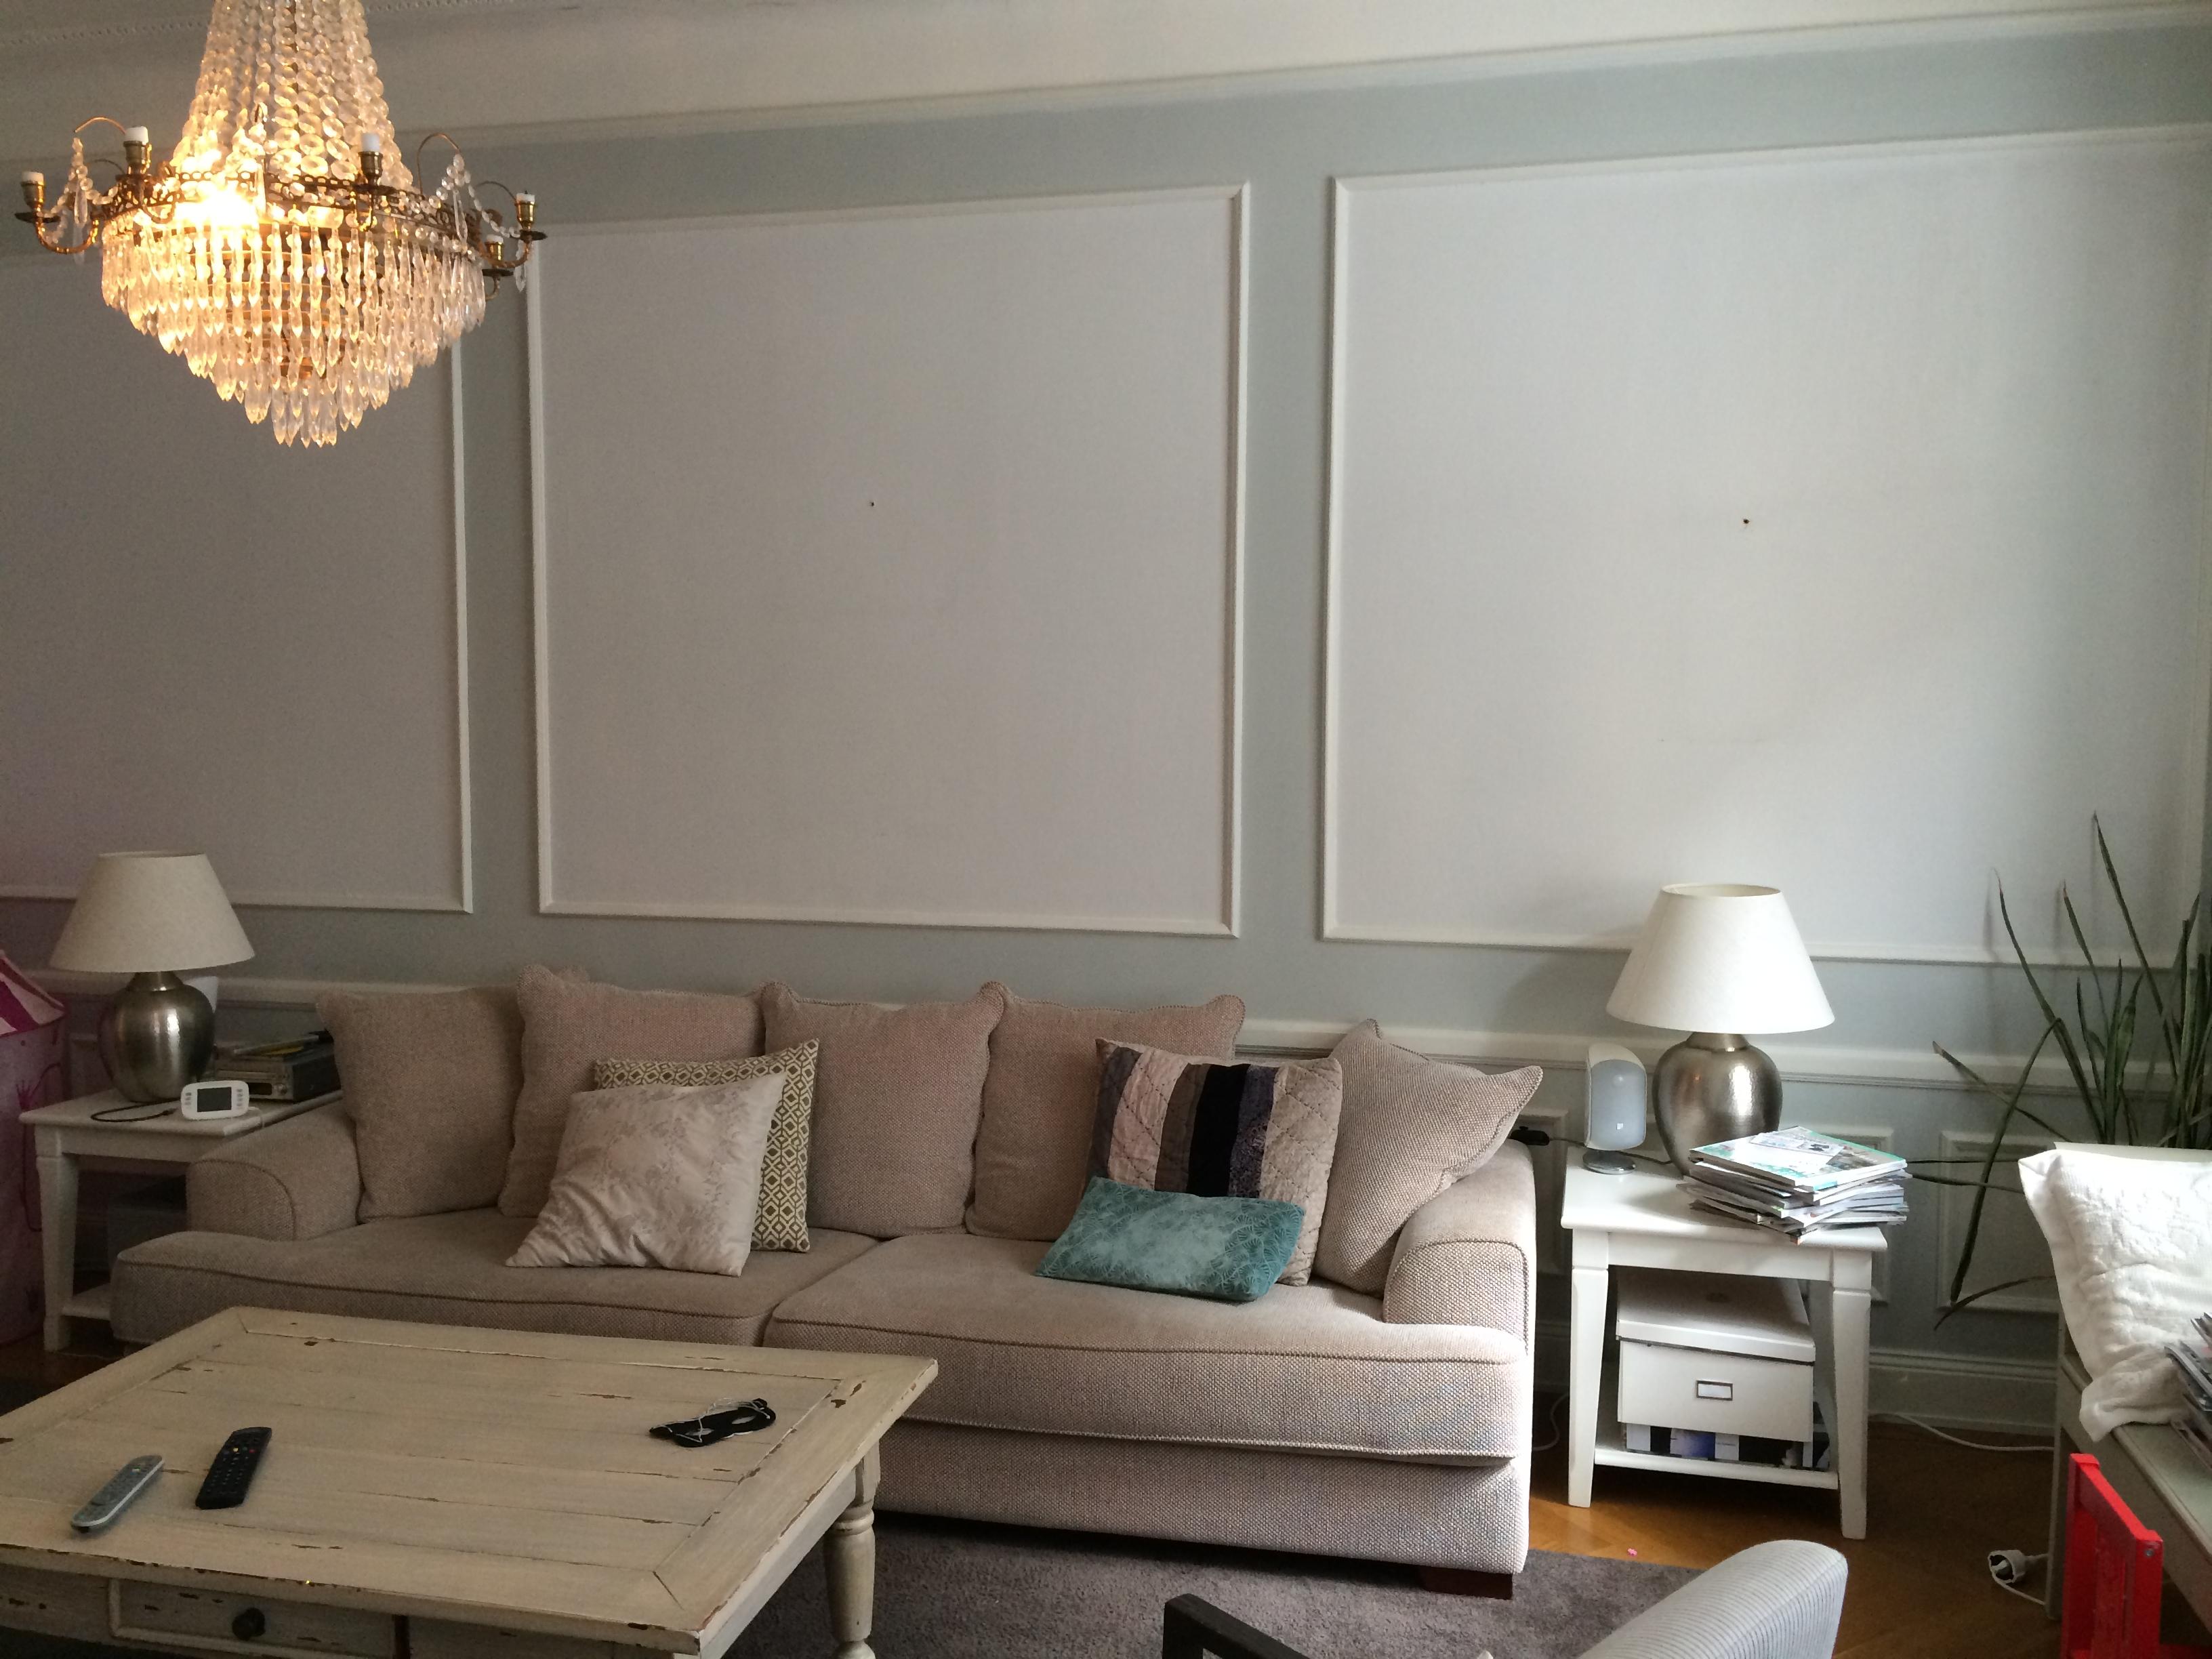 Apartment rent Newstay, Rådmansgatan 16, Östermalm